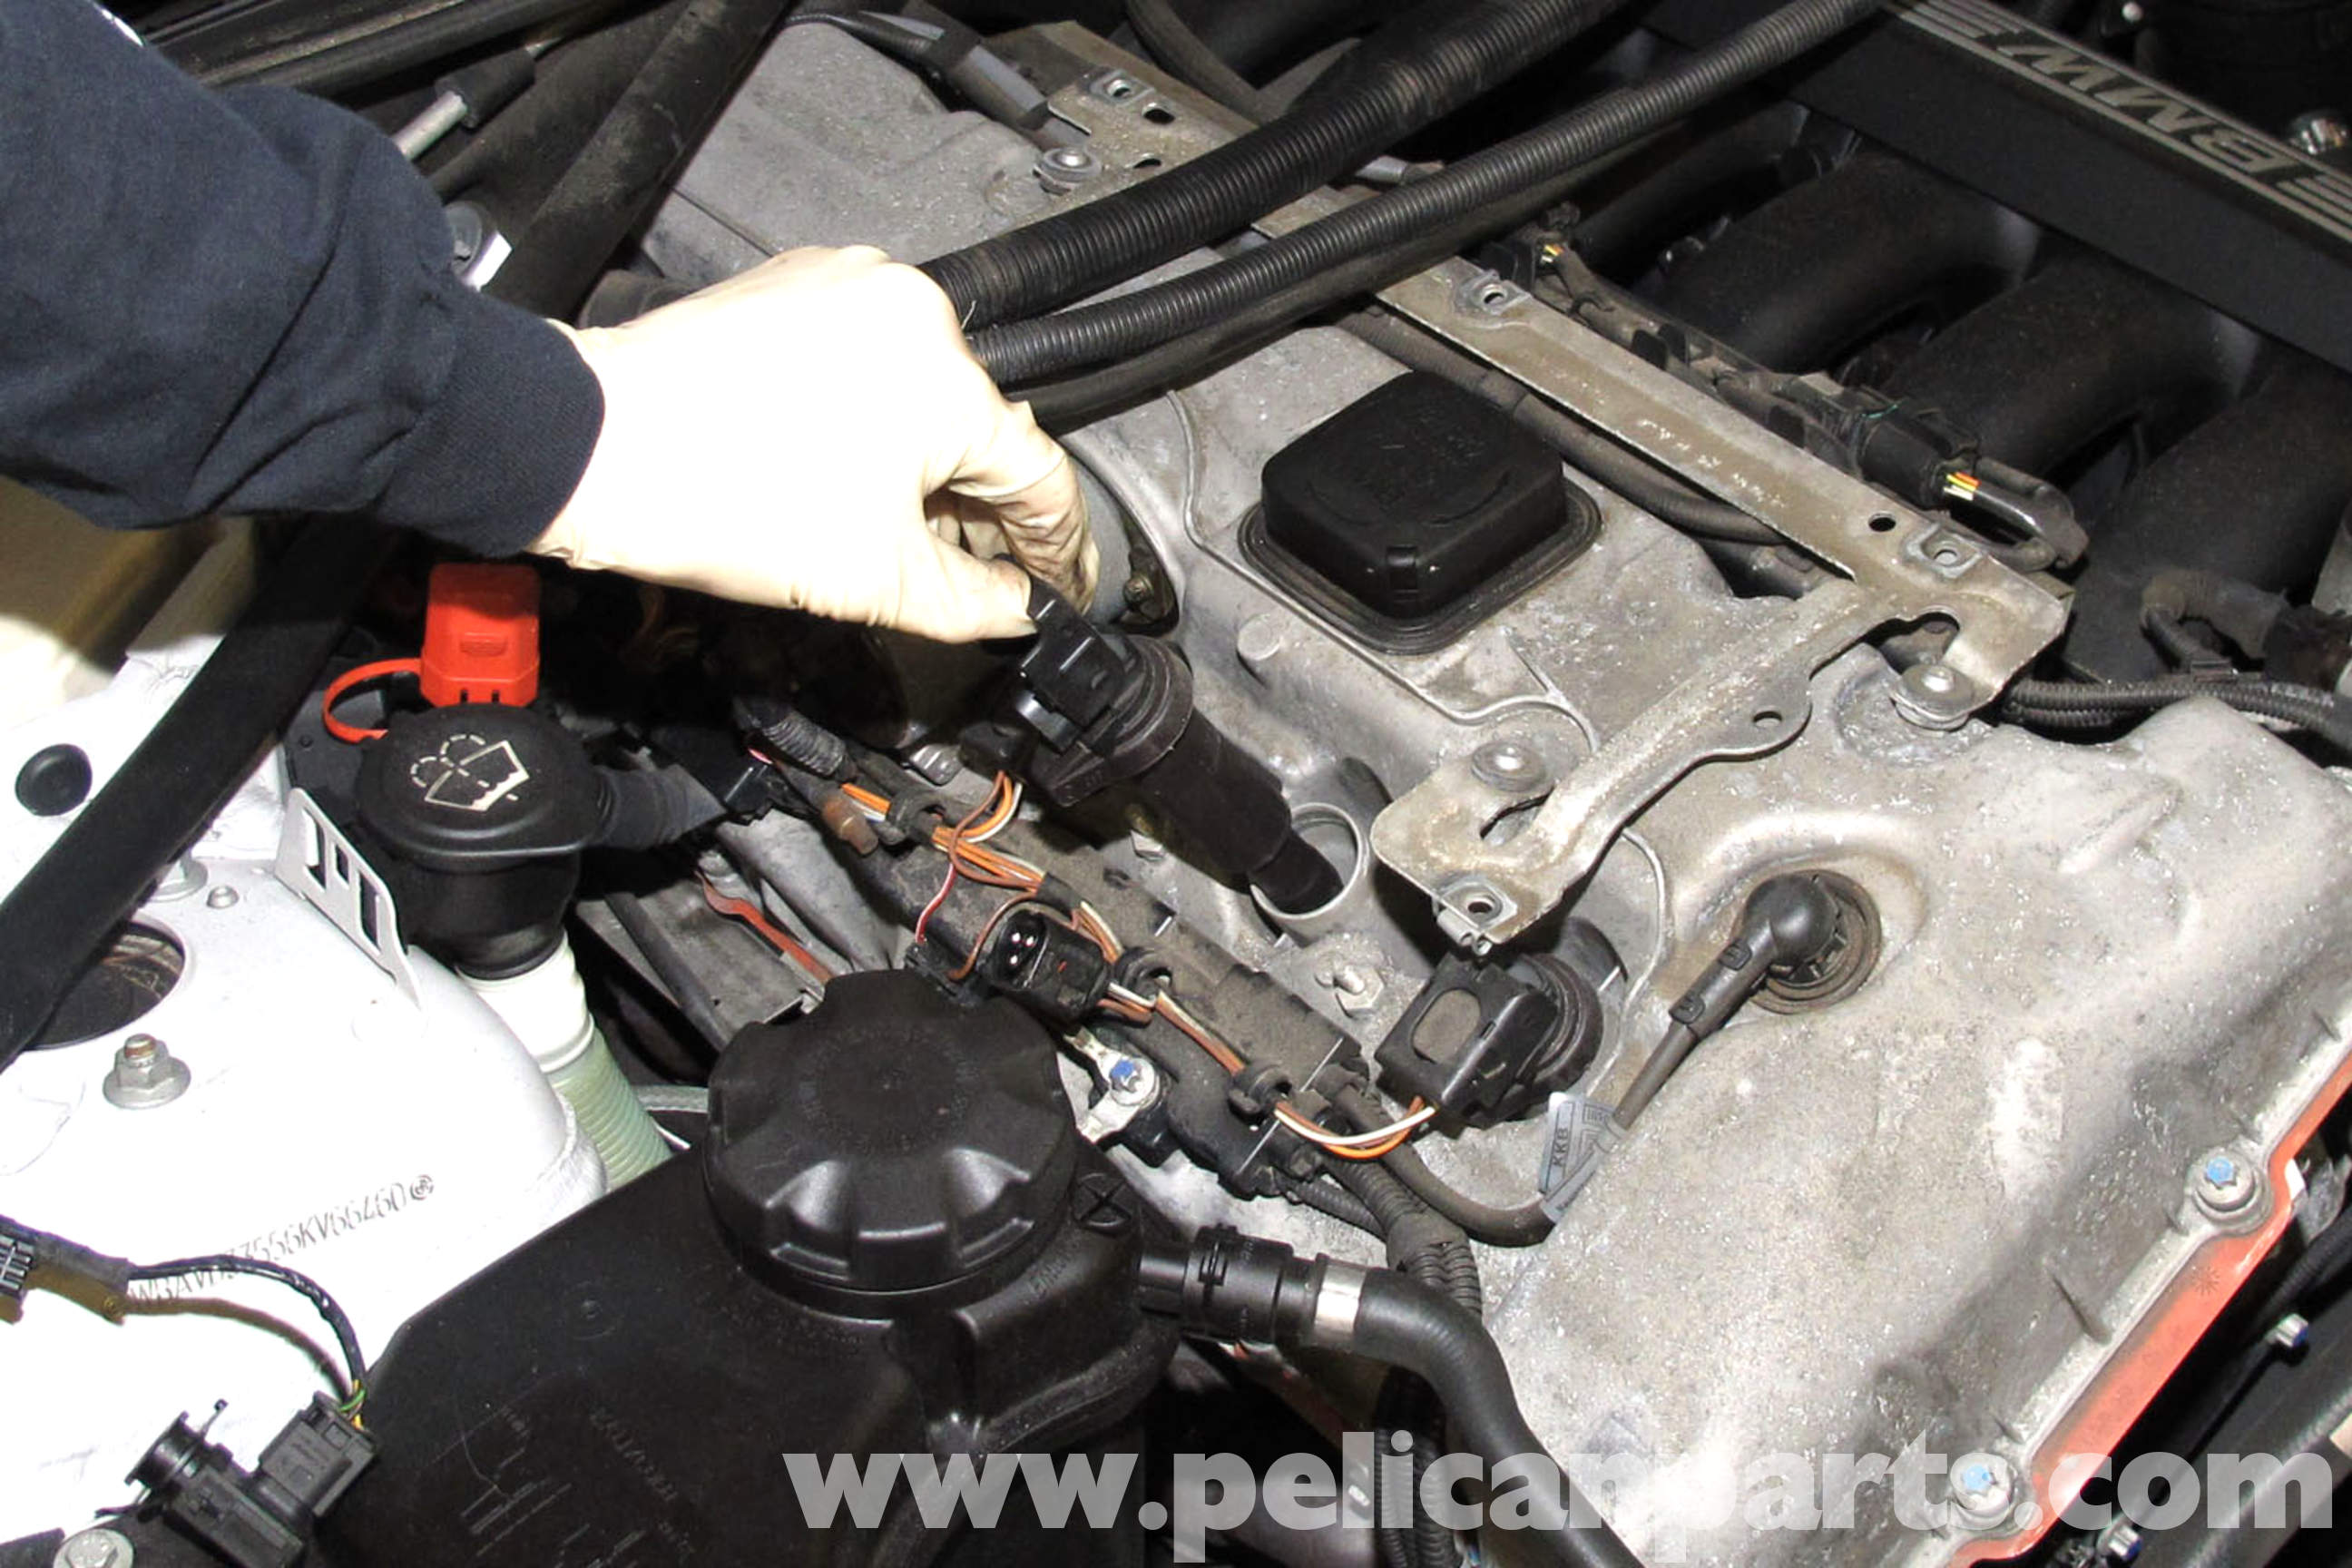 Series Fuse Box Diagram Bmw E90 Spark Plug And Coil Replacement E91 E92 E93